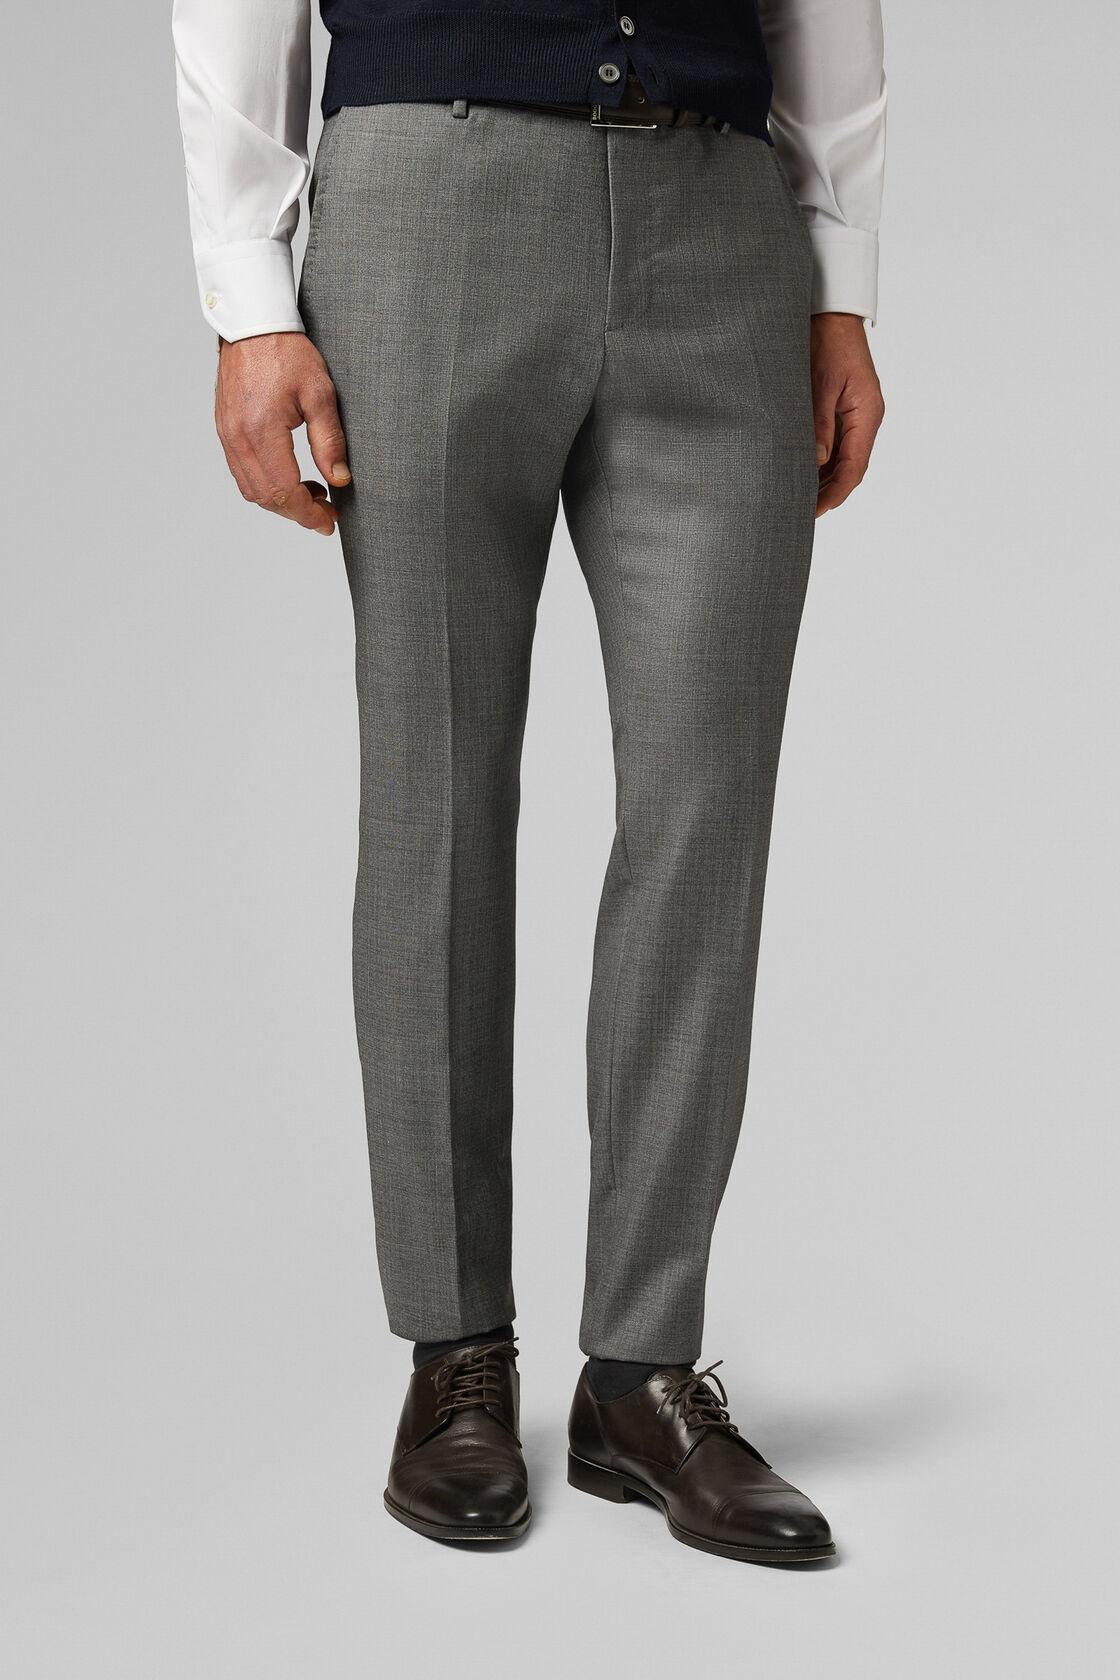 Pantalone Da Abito Grigio In Lana Slim, Grigio, hi-res